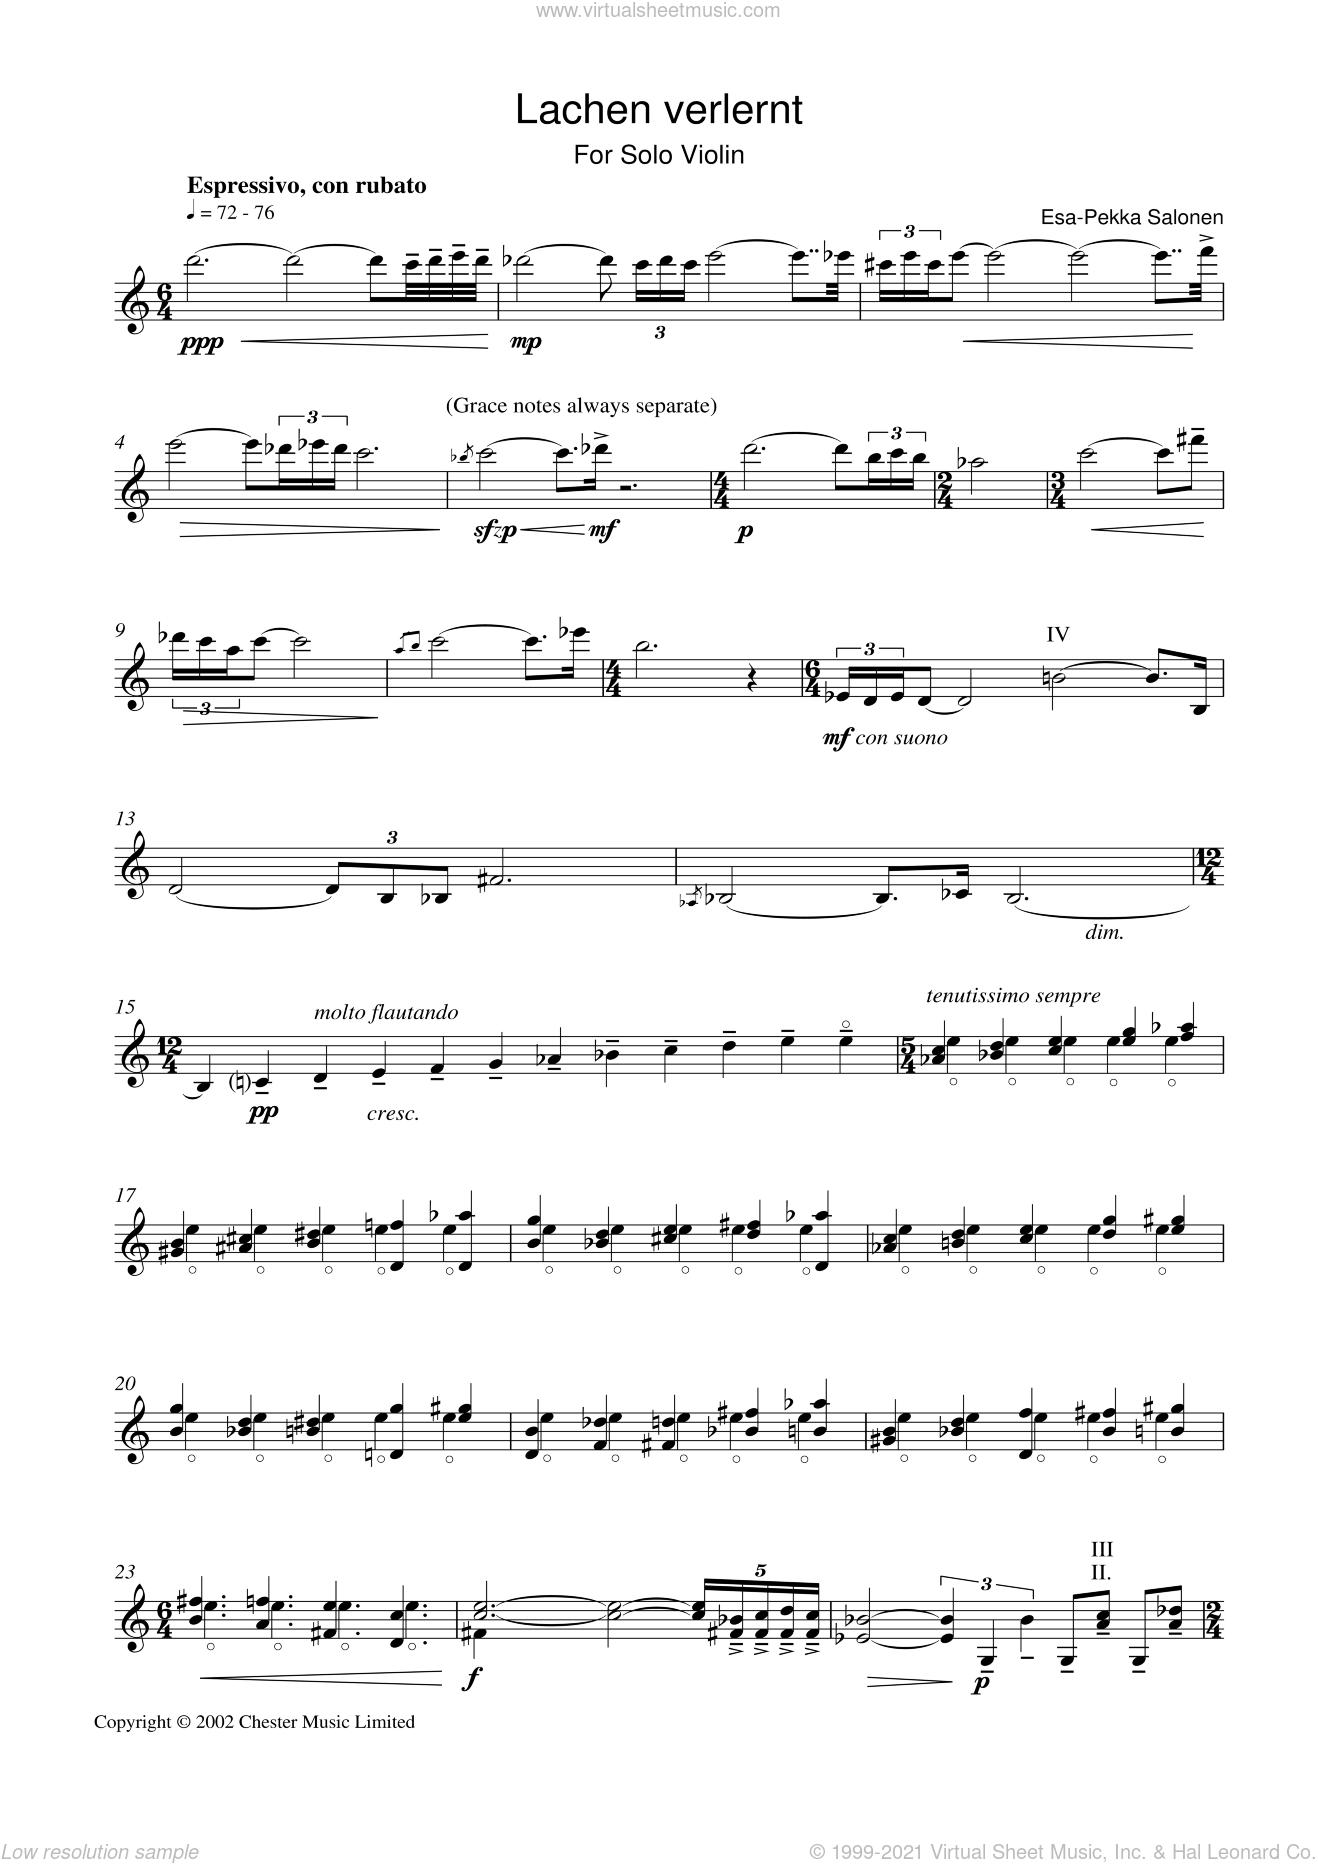 Lachen Verlernt sheet music for violin solo by Esa-Pekka Salonen, classical score, intermediate skill level